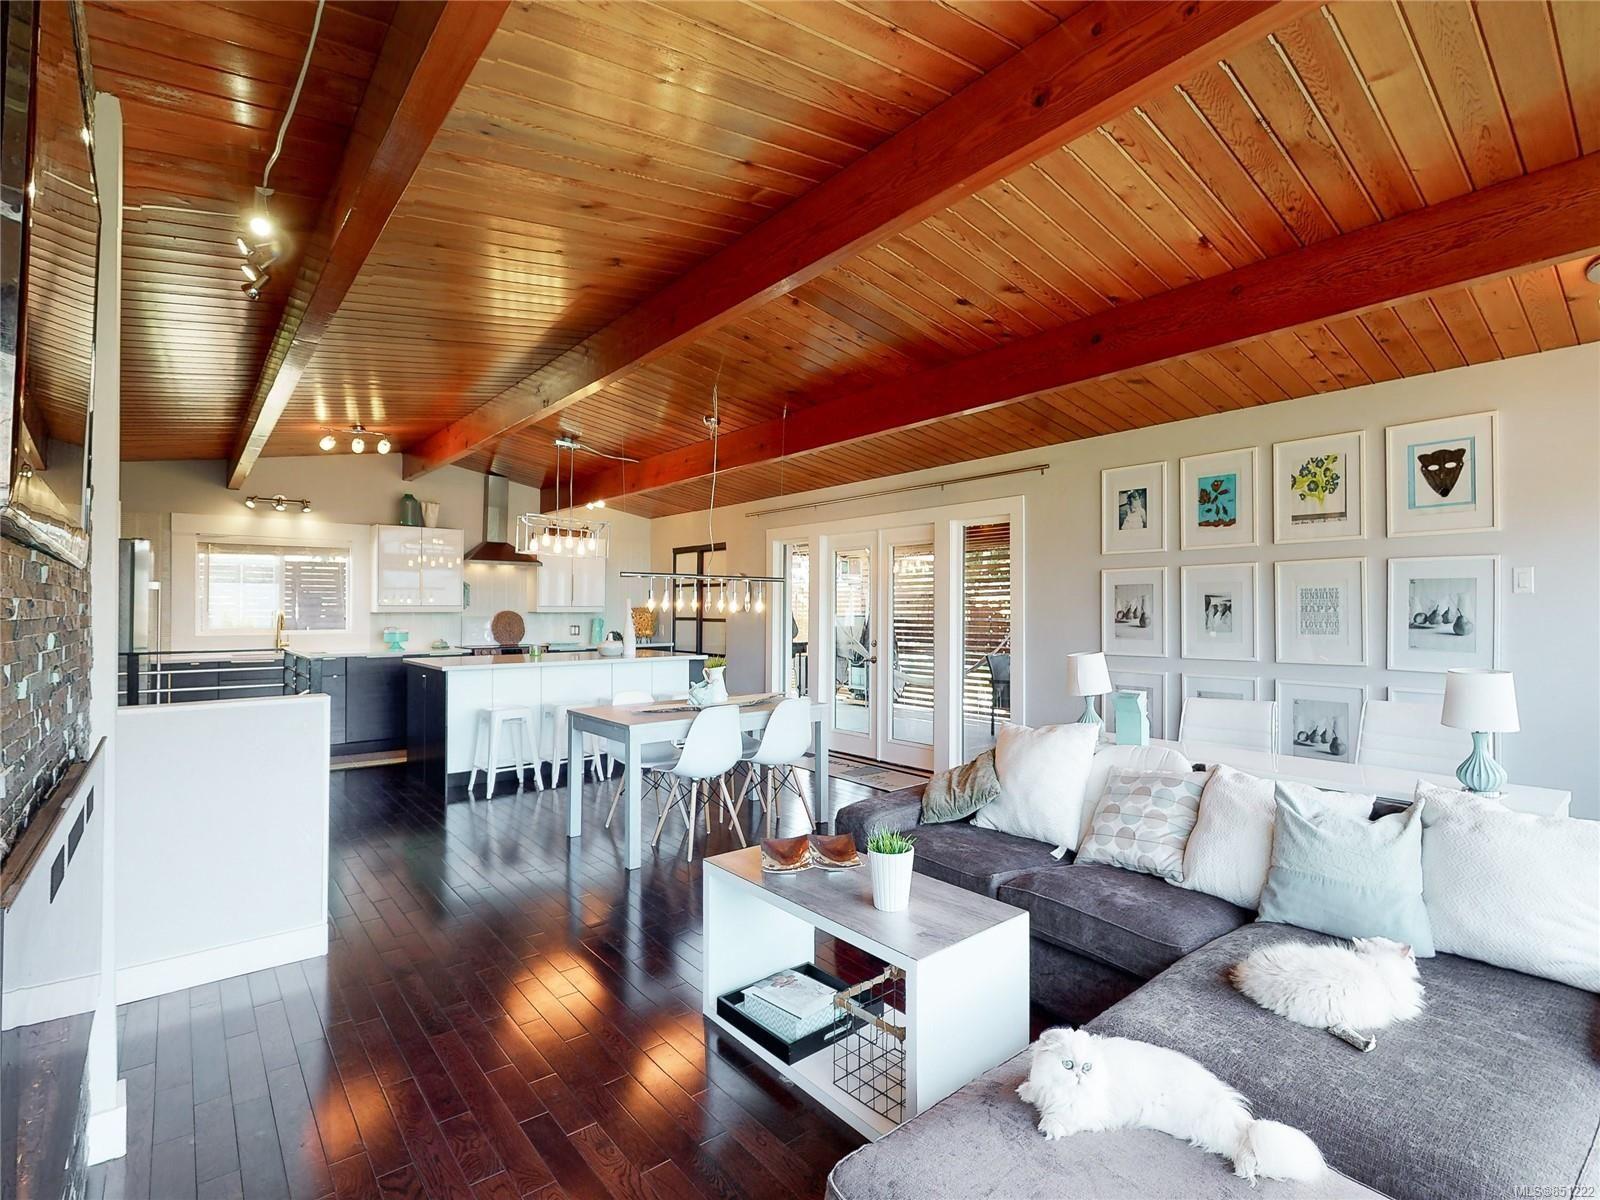 Photo 9: Photos: 2525 11th Ave in : PA Port Alberni House for sale (Port Alberni)  : MLS®# 851222